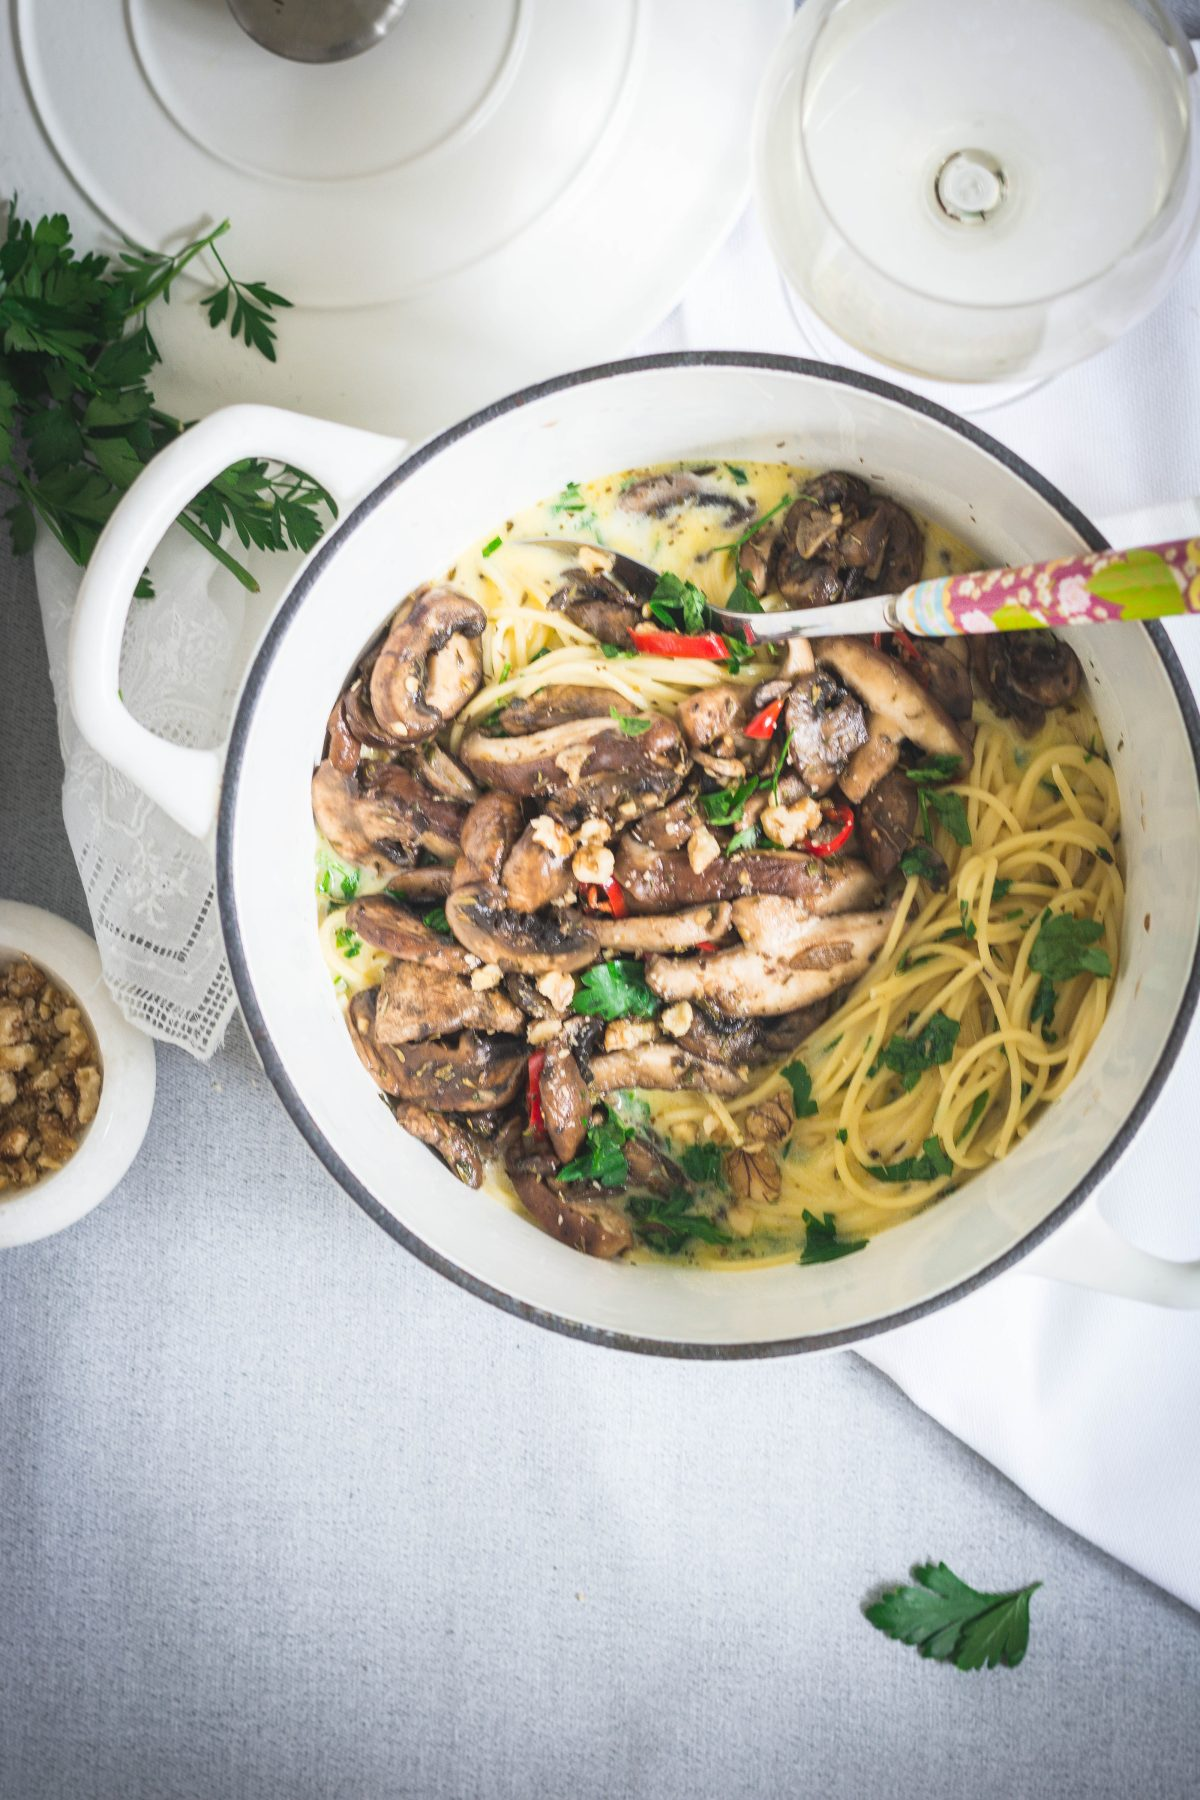 Spaghetti, Mascarpone Sauce, Mushrooms